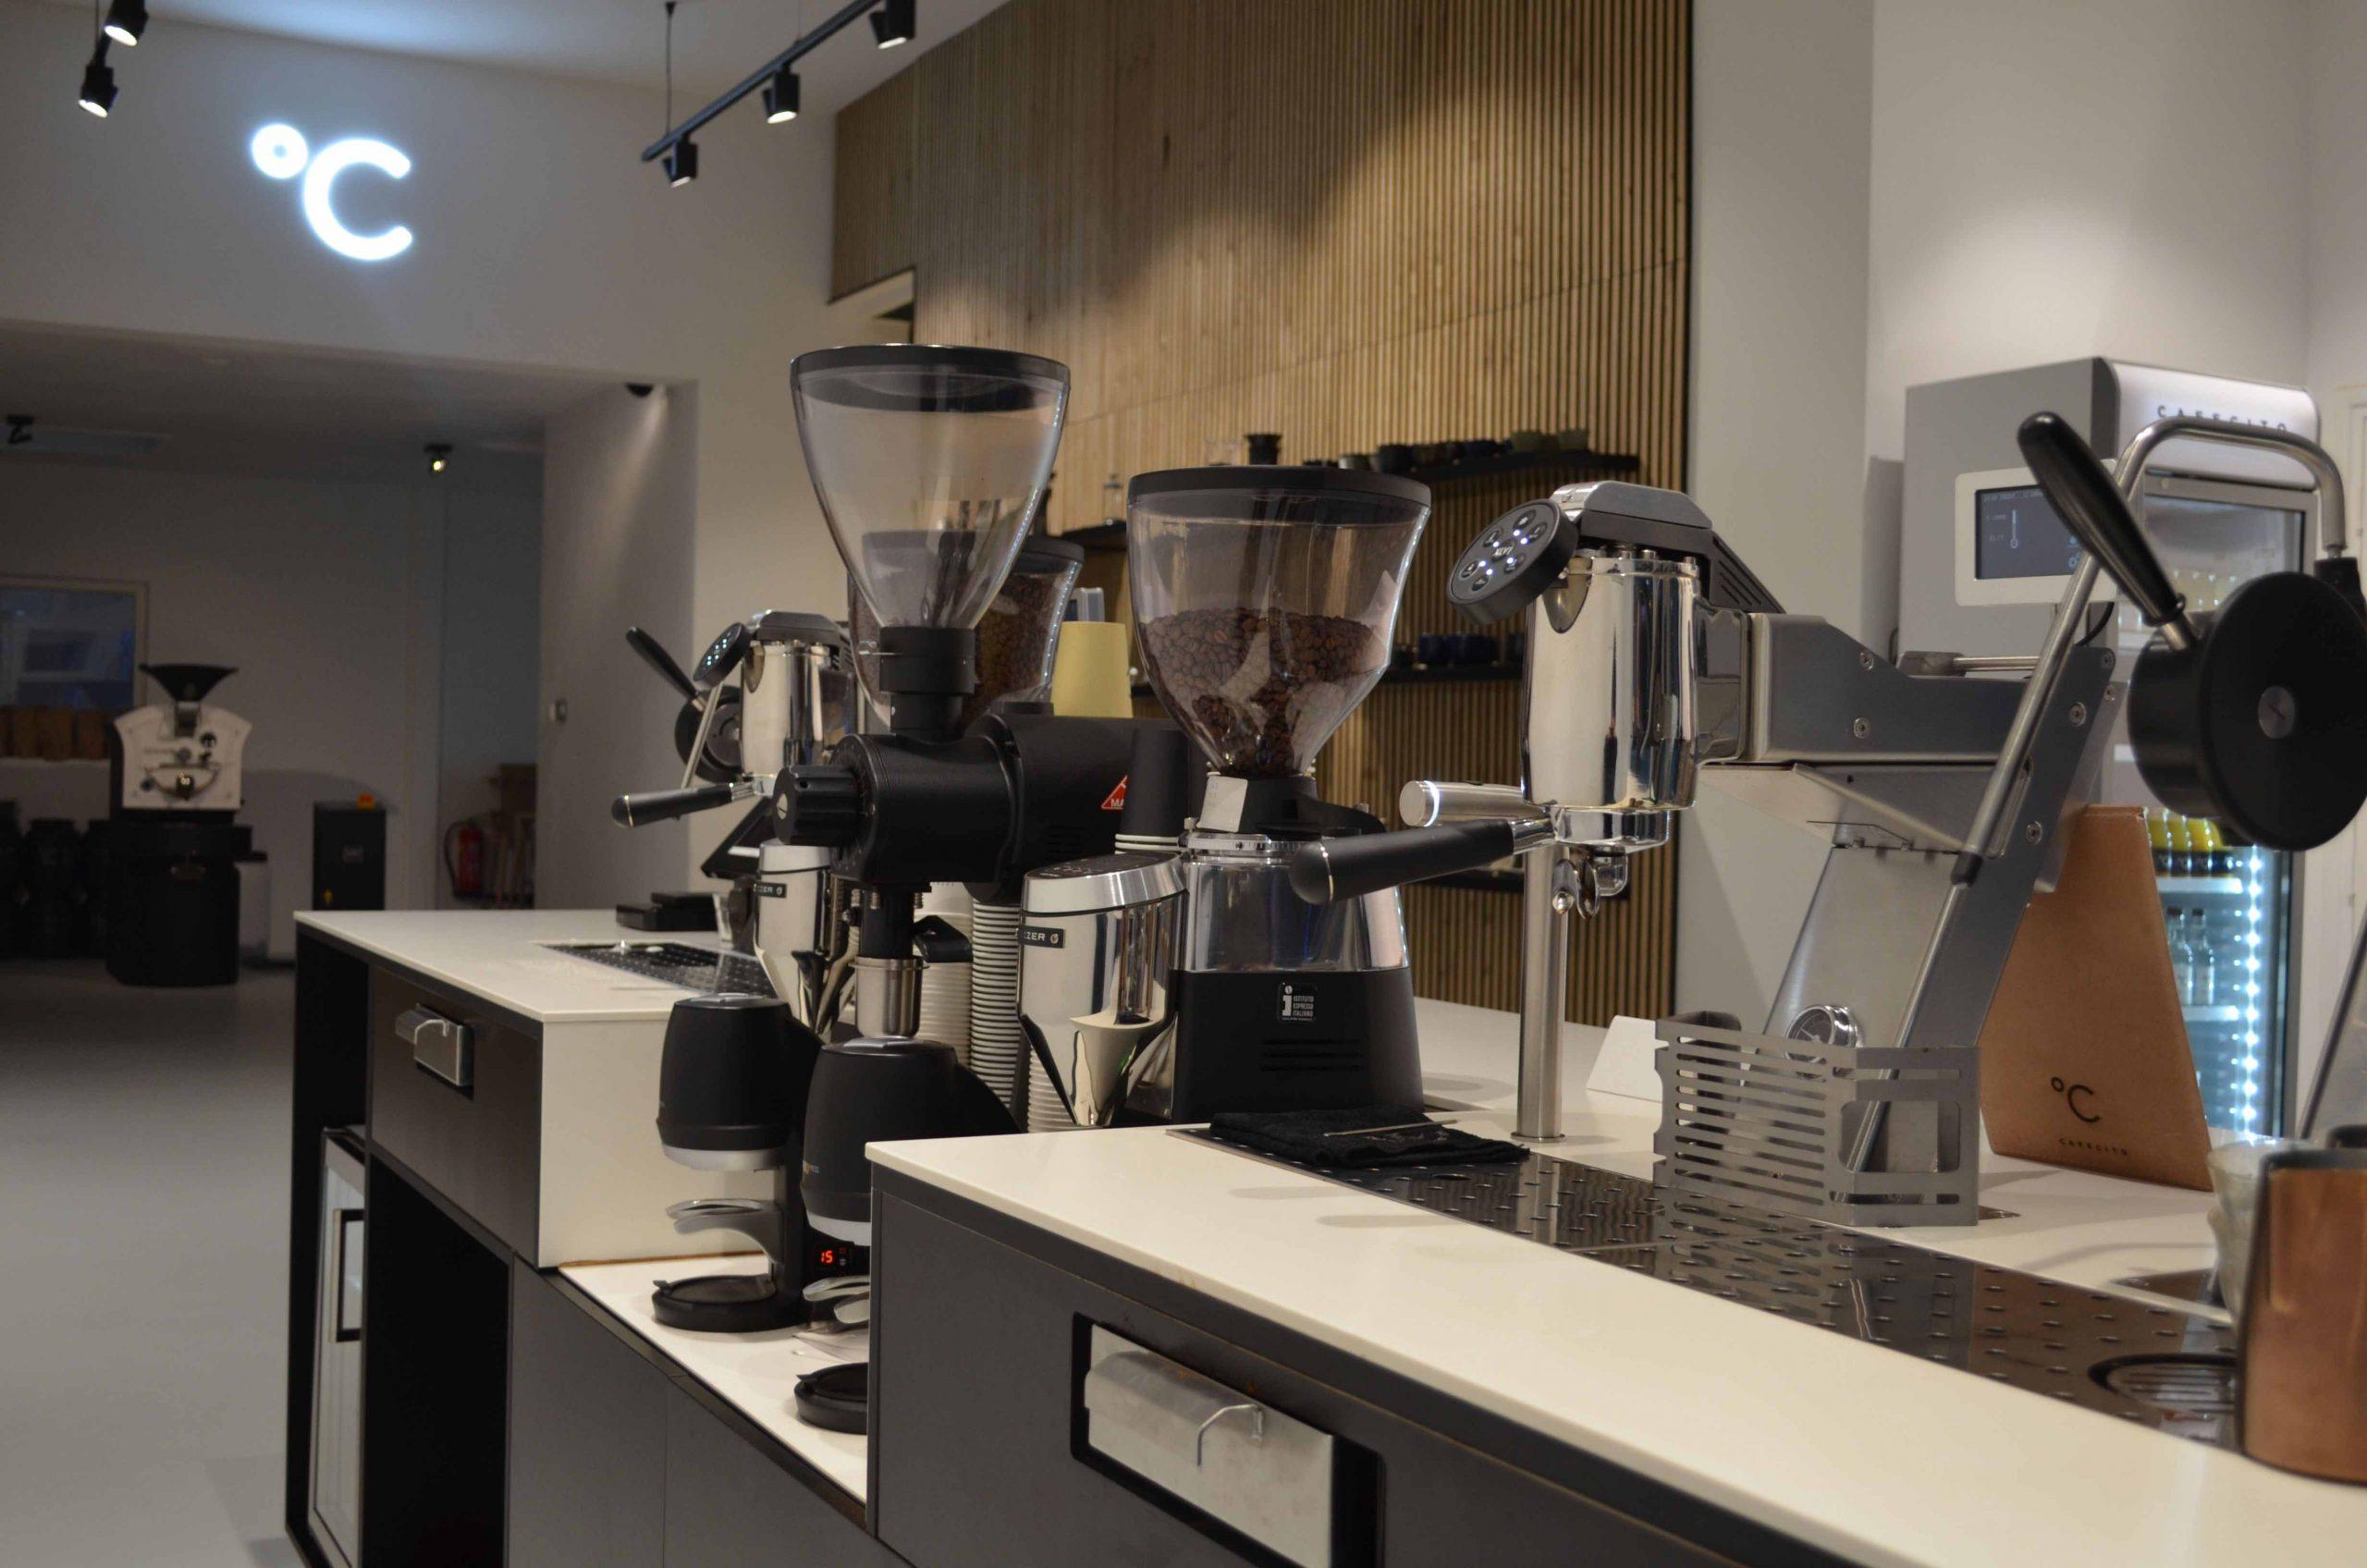 Koffiebar Amsterdam, koffie apparaten met filters